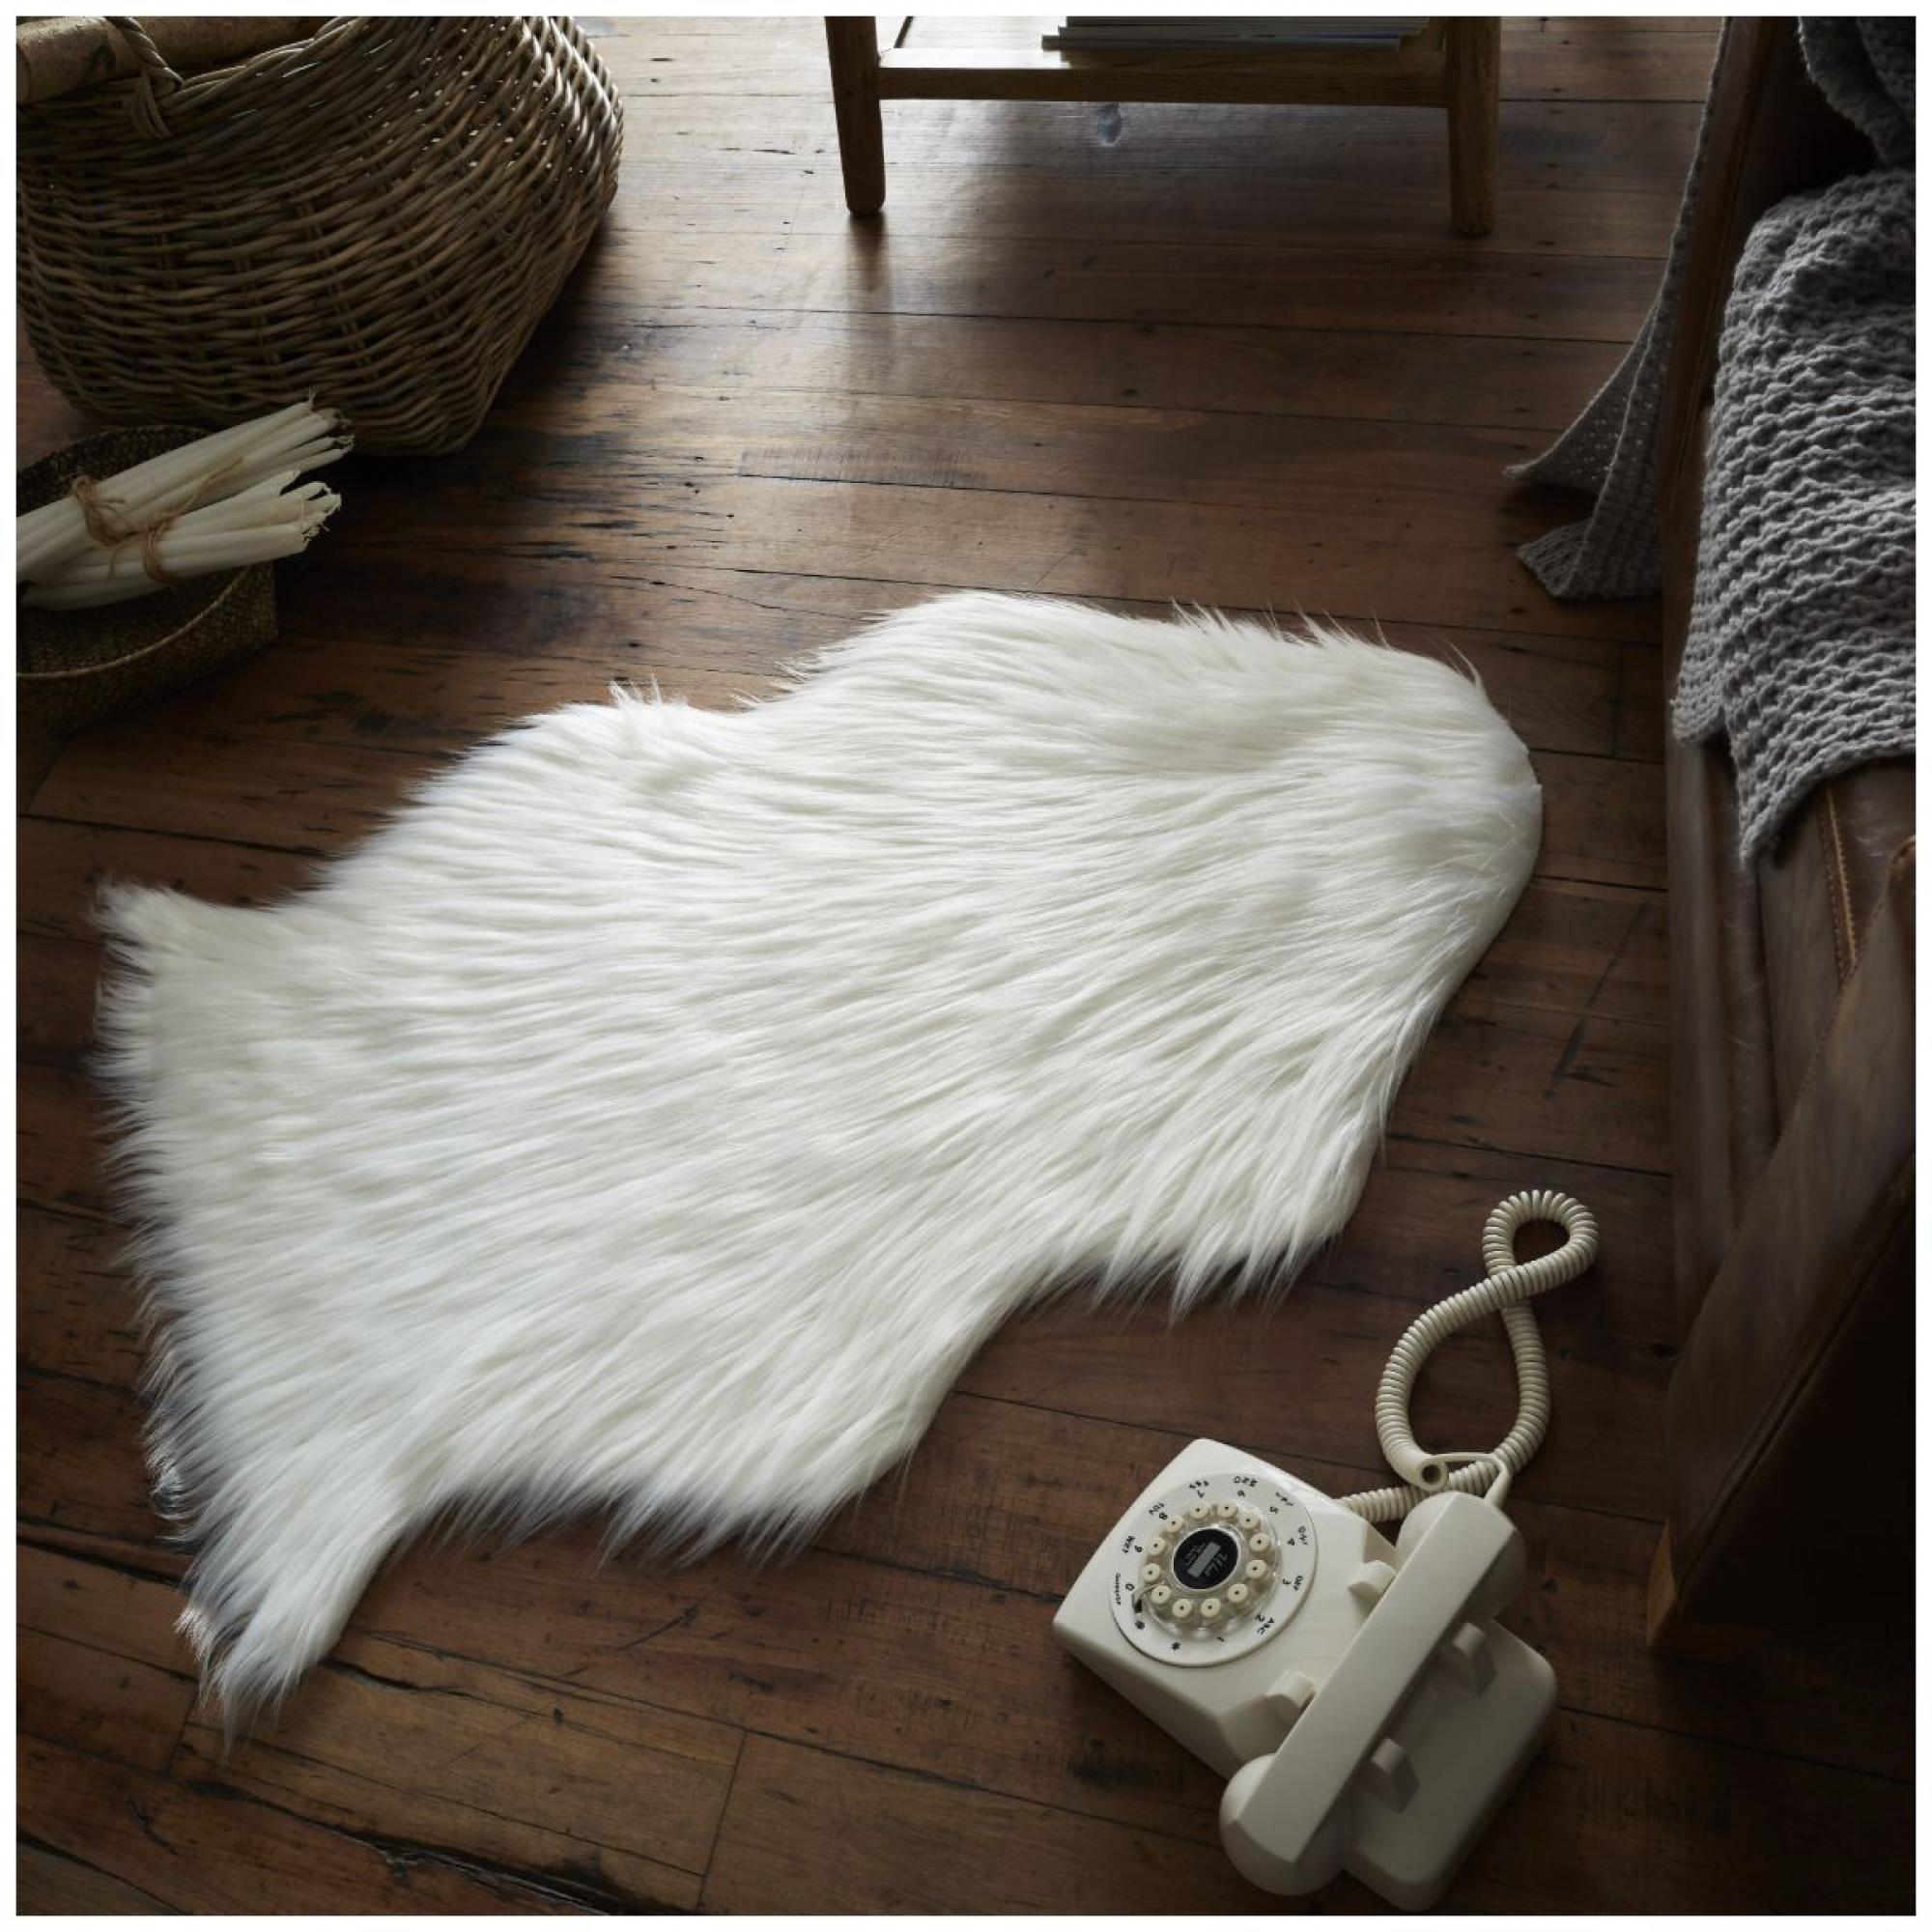 FAUX FUR SHEEP RUG 60X90 WHITE 6475